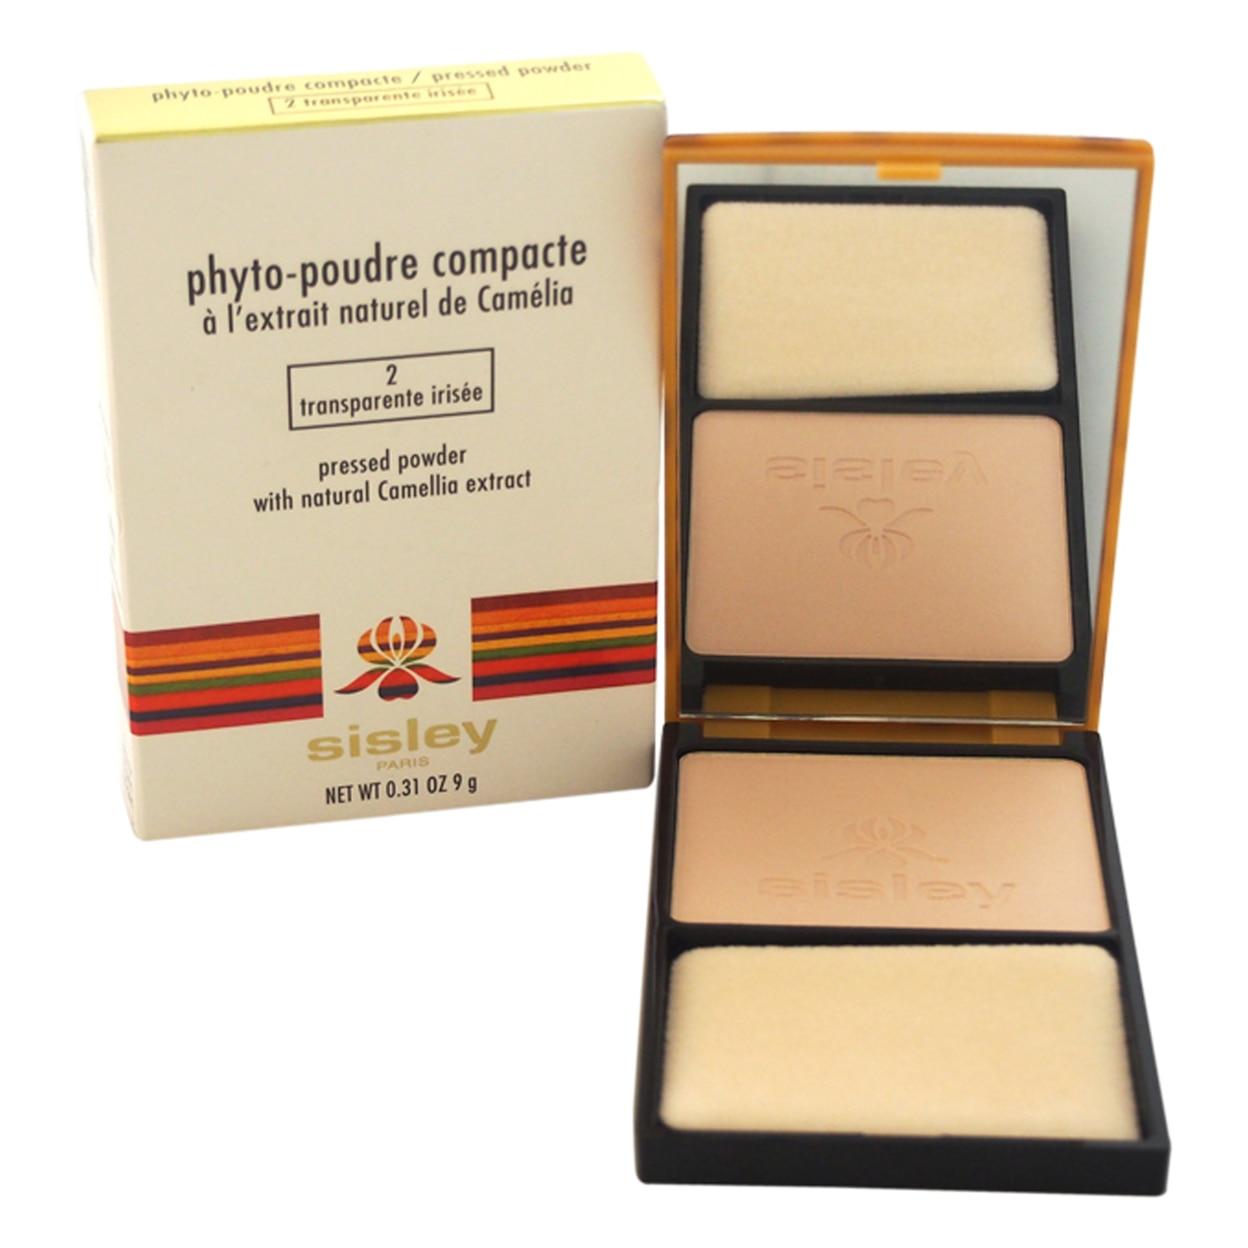 Phyto-Poudre Compacte Pressed Powder - # 2 Transparente Irisee by Sisley for Women - 0.31 oz Powder spirulina pacifica powder 16 oz multi pack